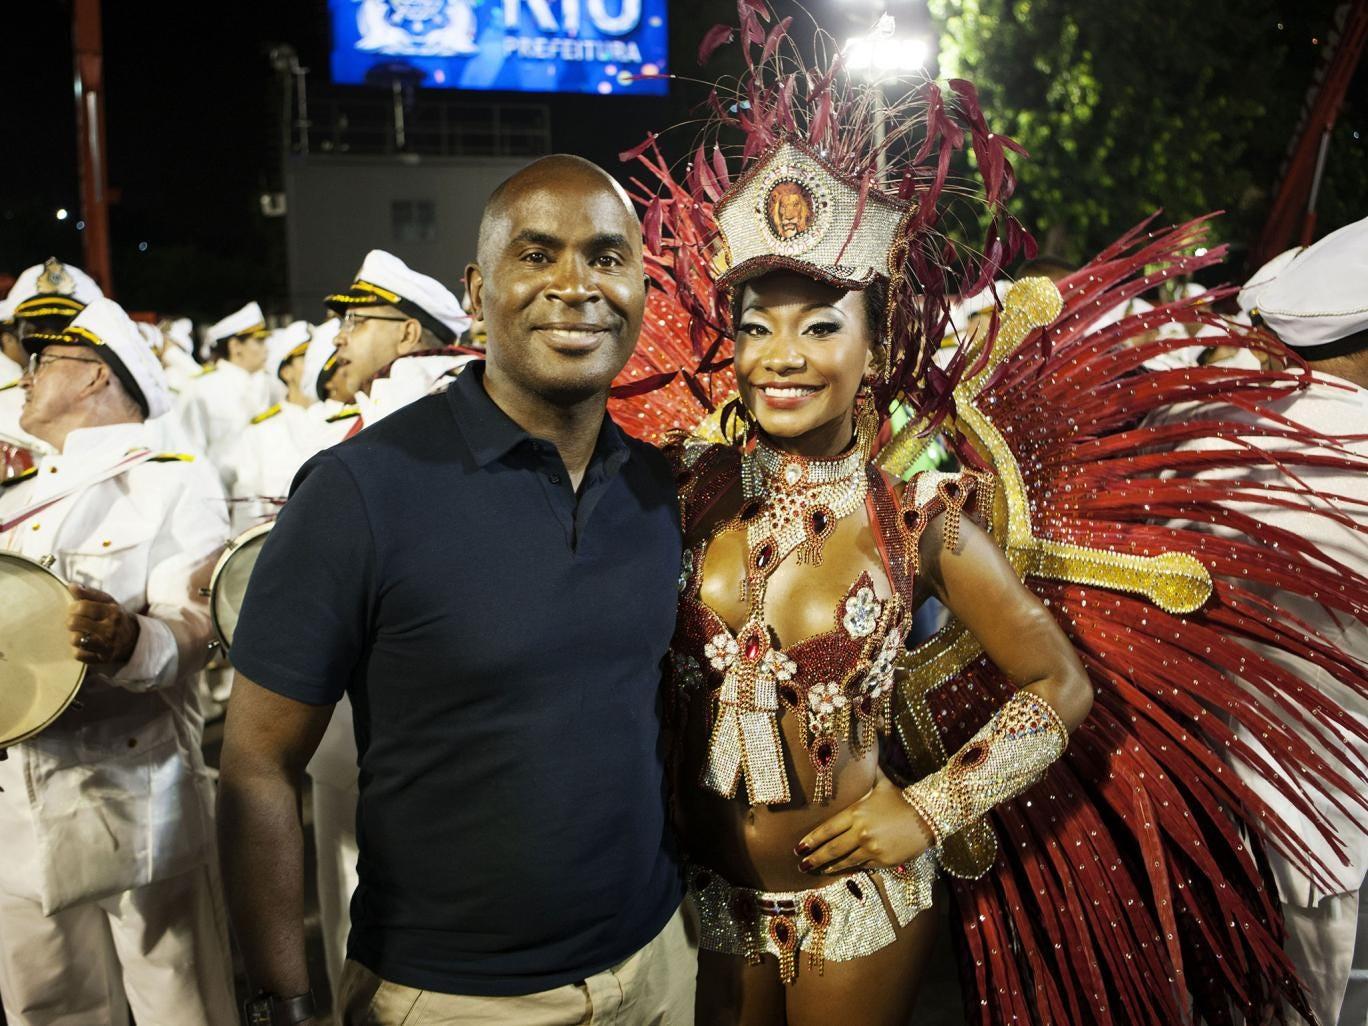 Robert Beckford attends Carnival in Rio de Janeiro in Seven Wonders of Brazil